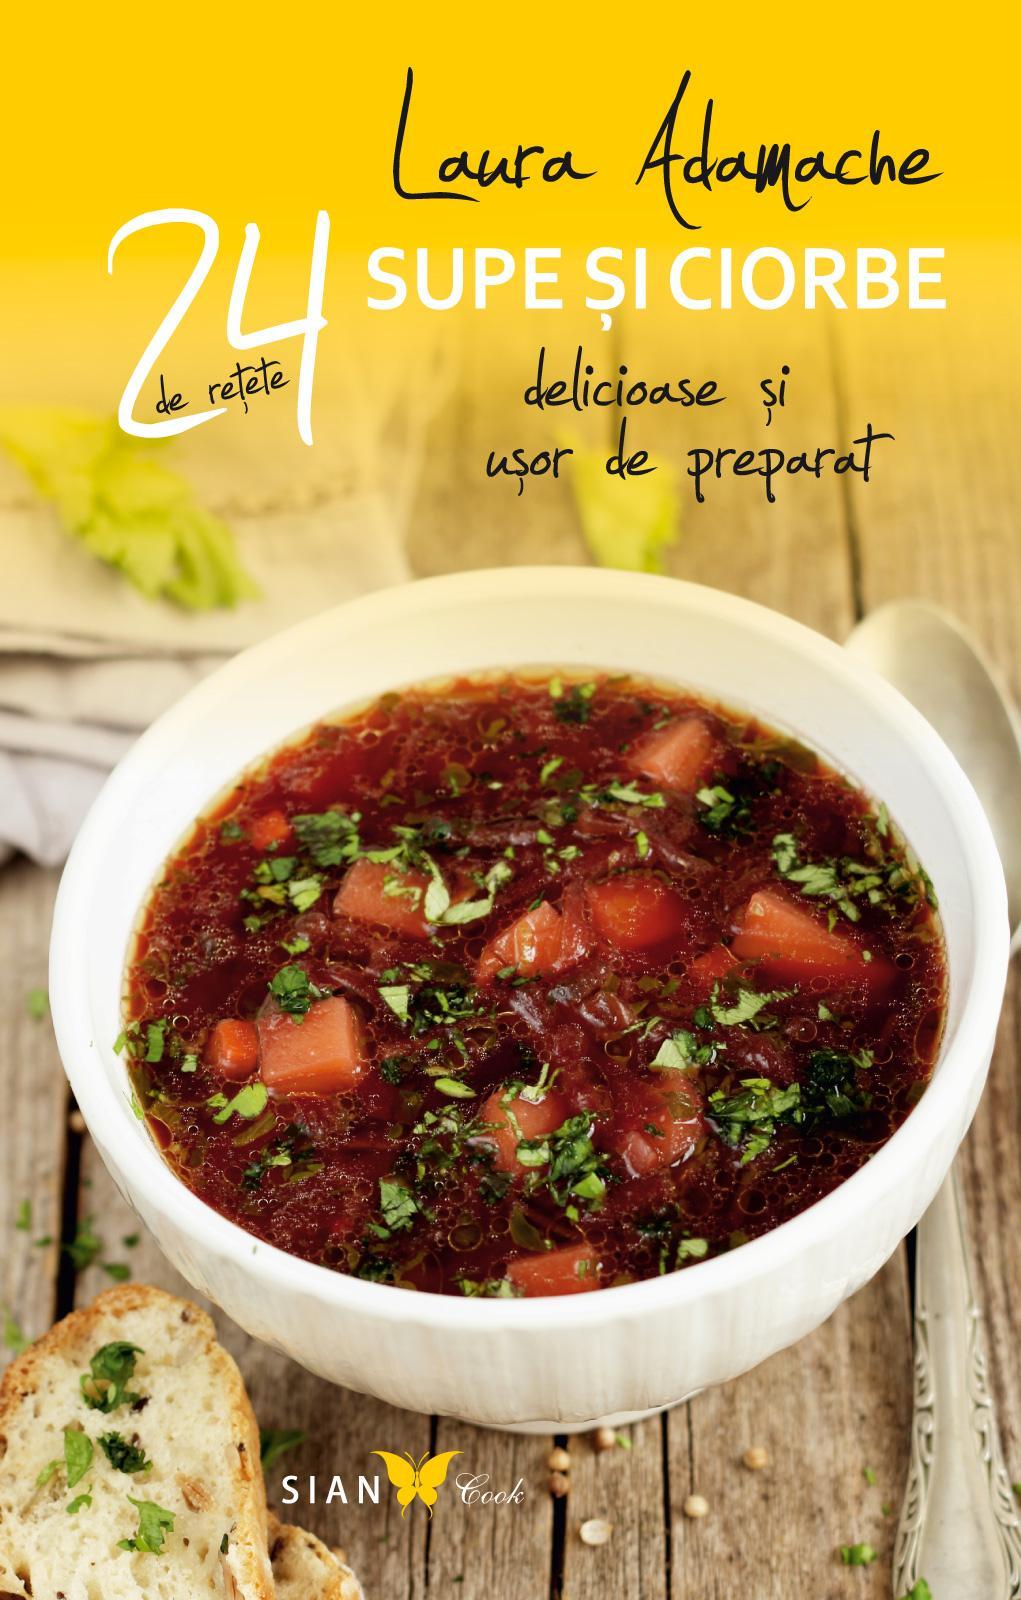 24 de supe și ciorbe delicioase și ușor de preparat